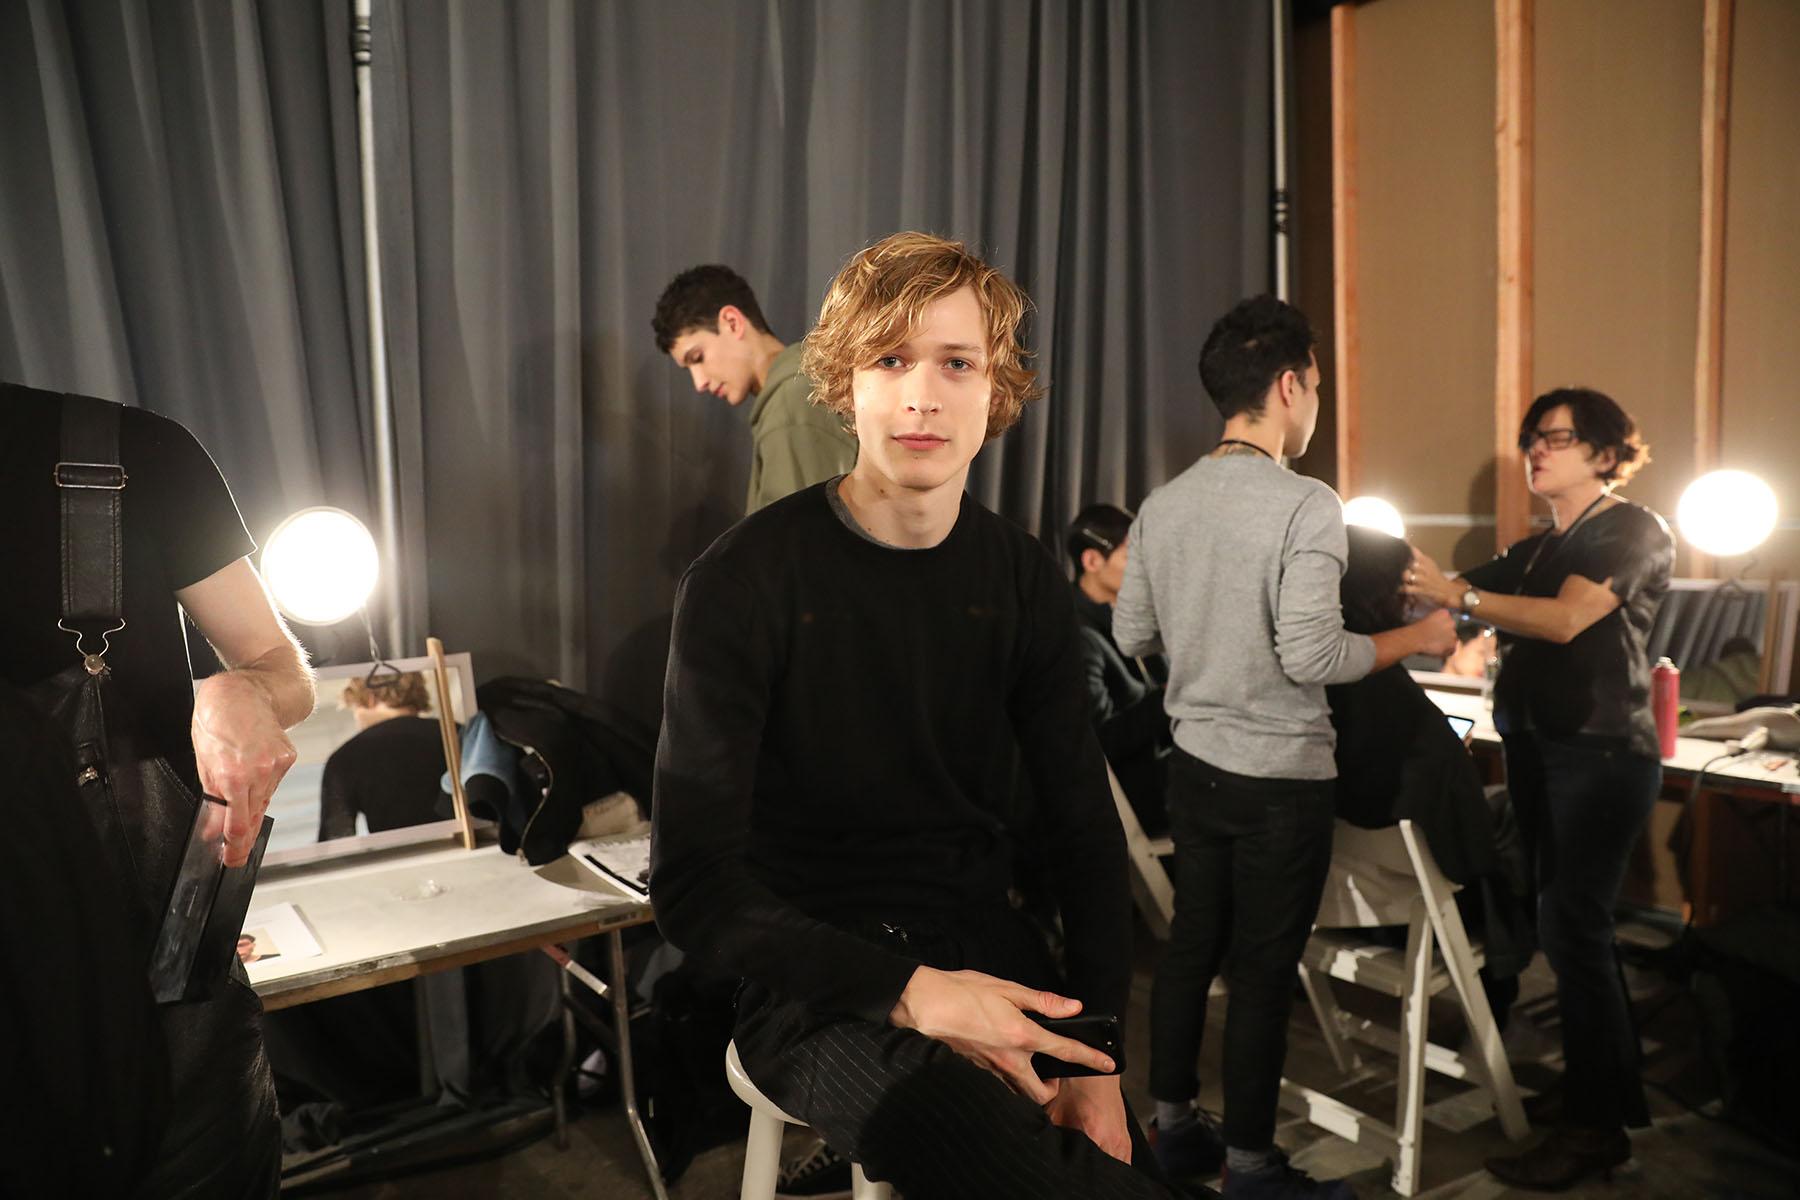 John-Elliott-Fall-2017-mens-fashion-show-backstage-the-impression-002